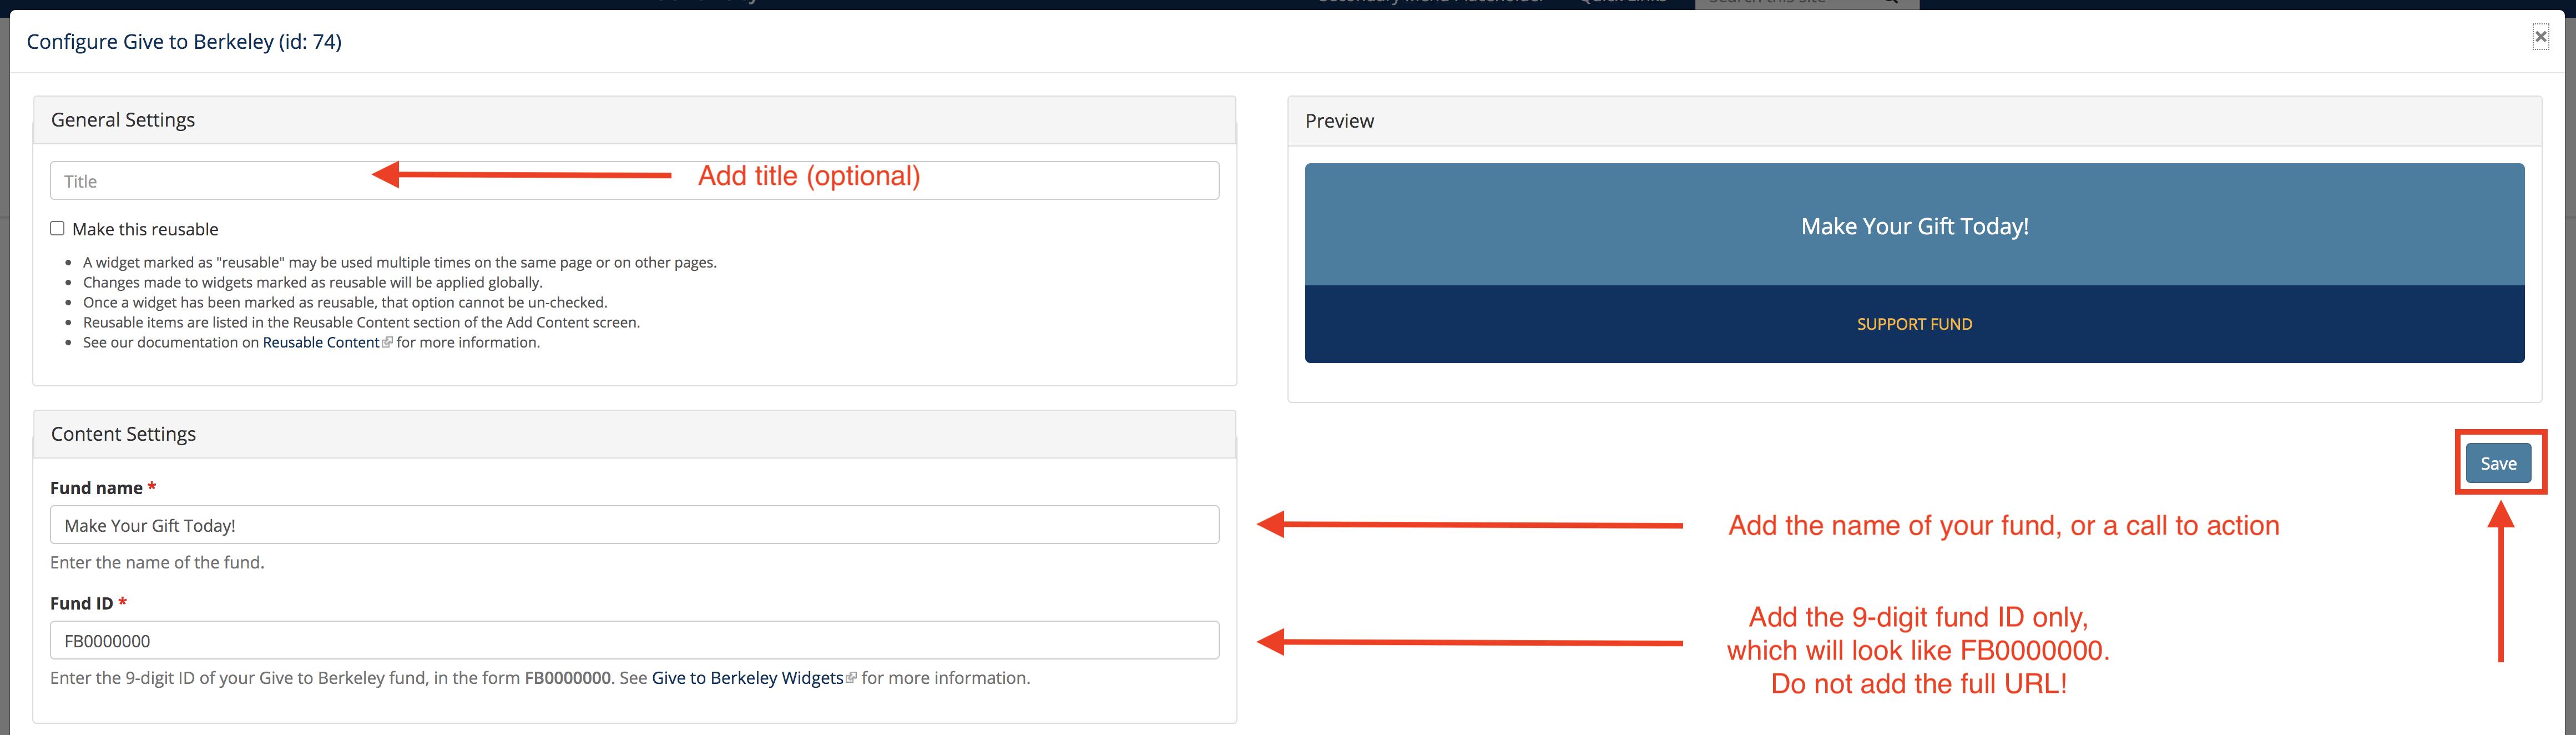 Screenshot of Give to Berkeley configuration screen